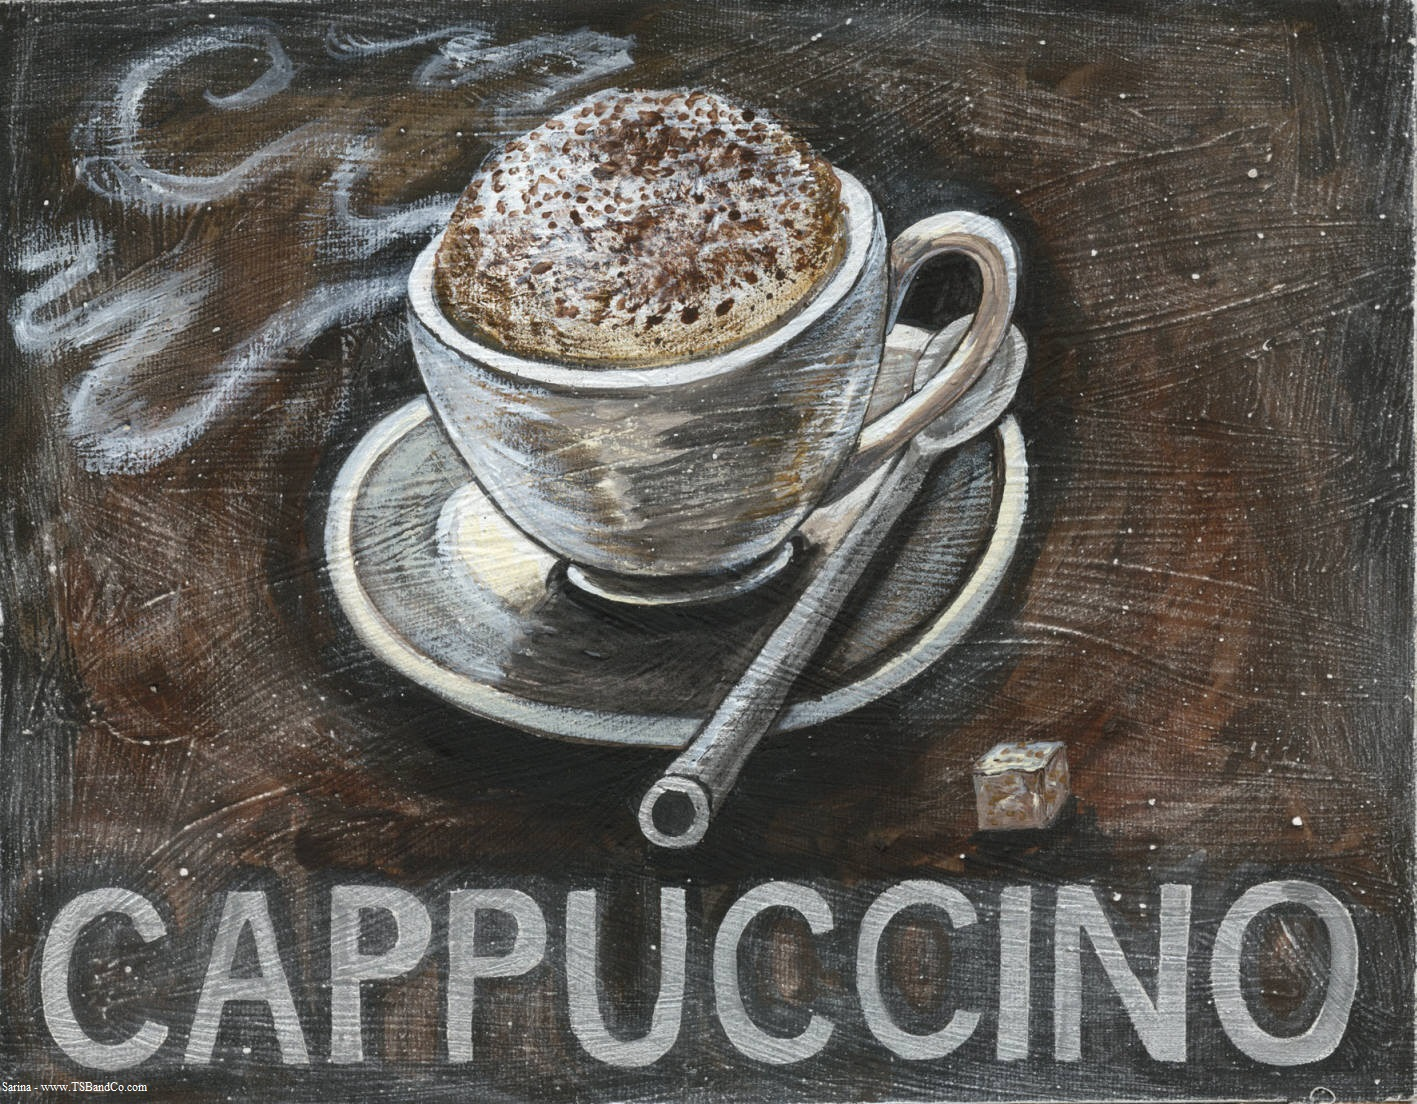 Sarina TSB 492-Cappuccino.jpg